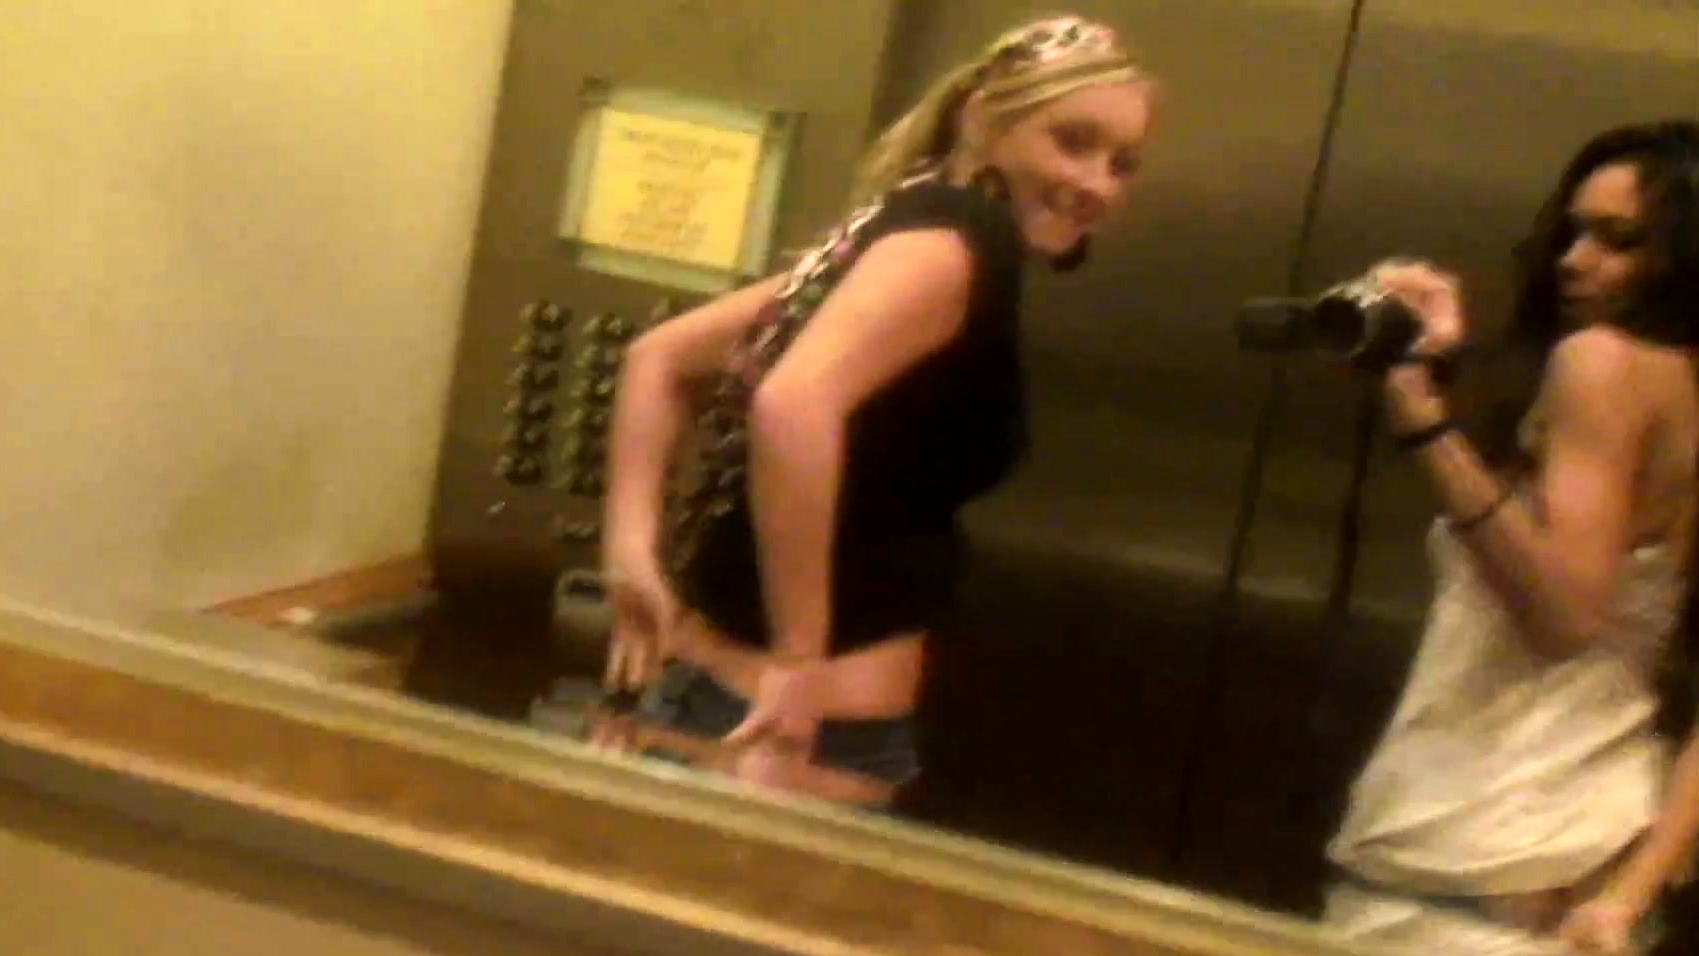 Elevator nude lesbians